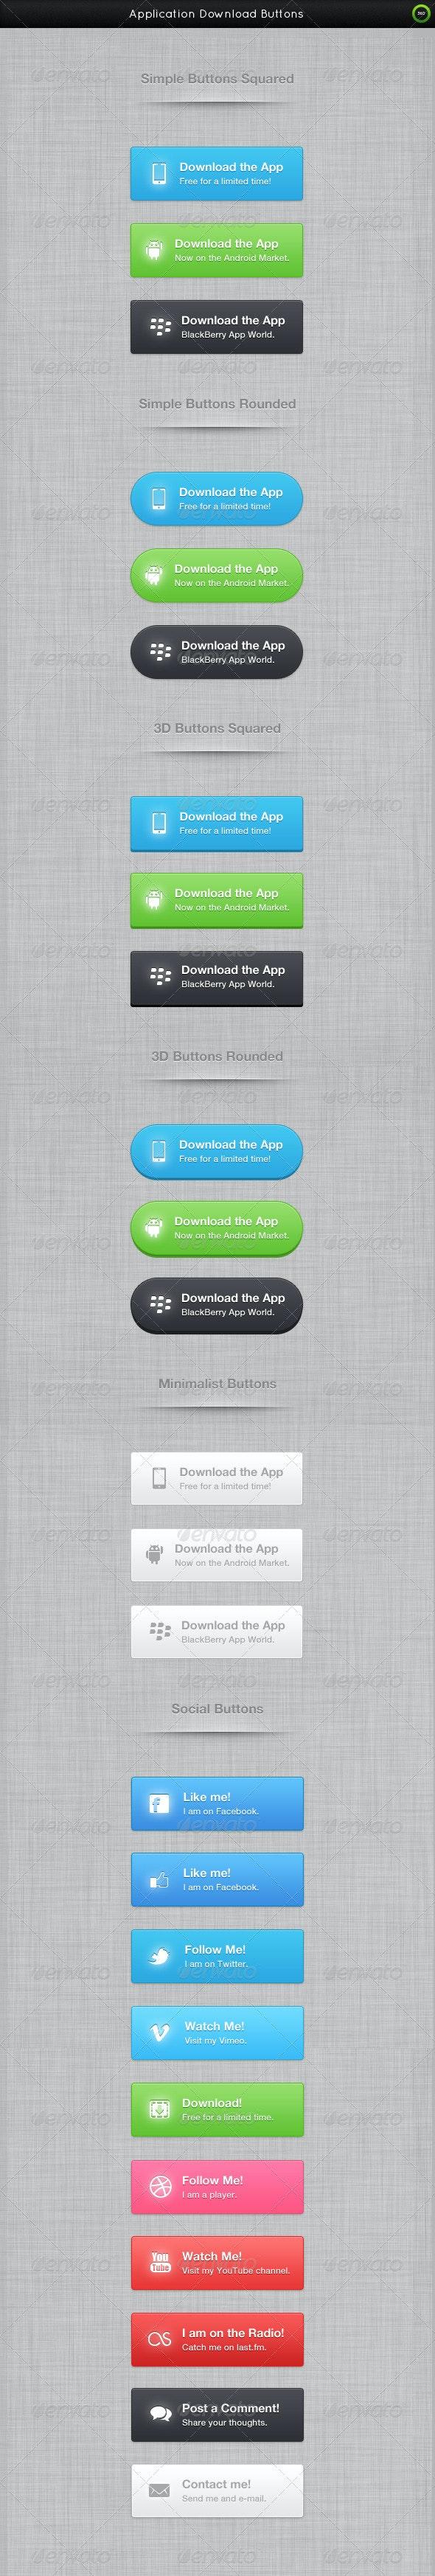 Application Download Buttons + Social Buttons - Buttons Web Elements